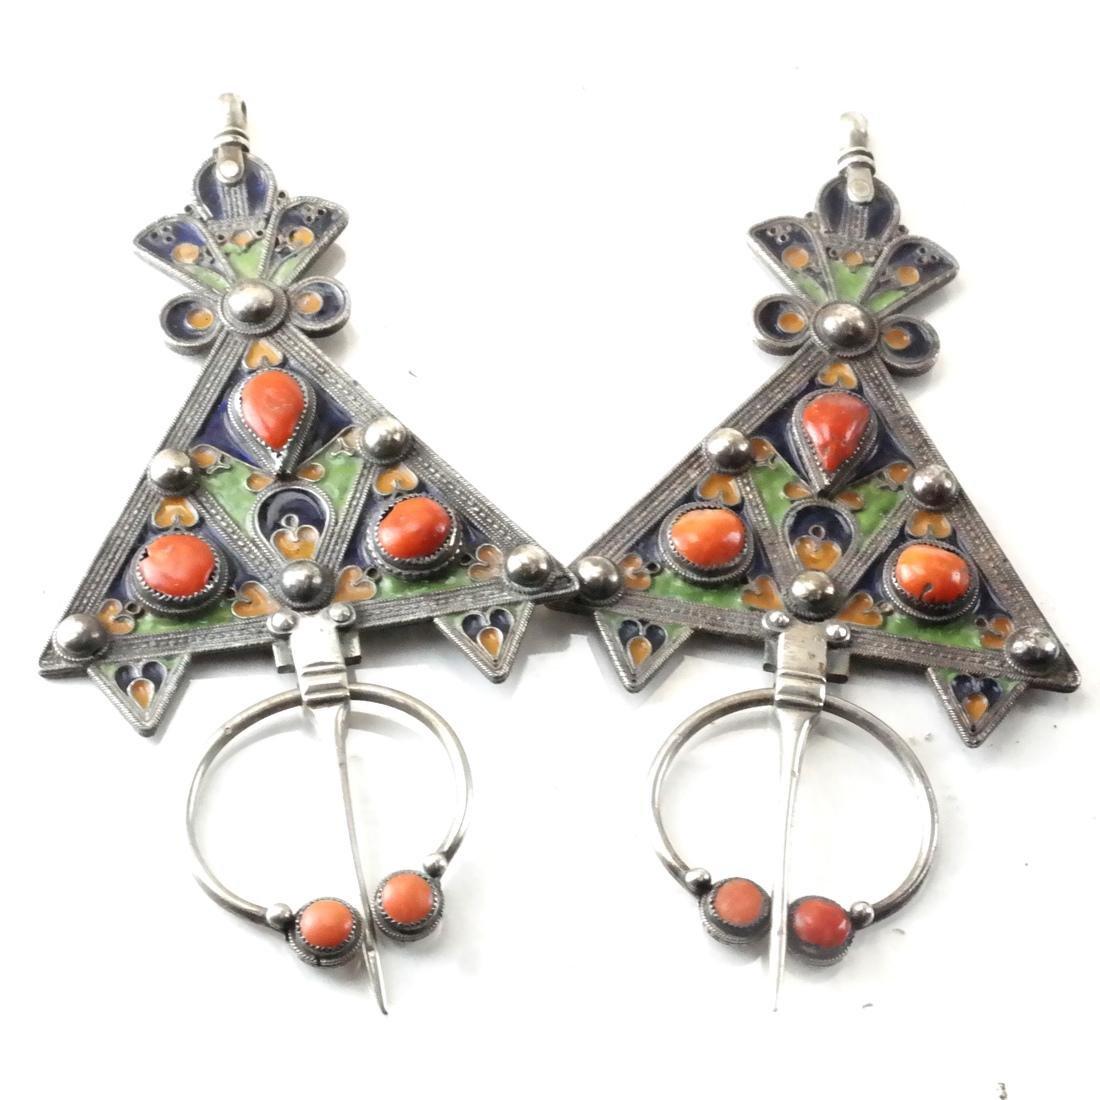 Antique Silver & Enamel Afghan/Central Asian Drops